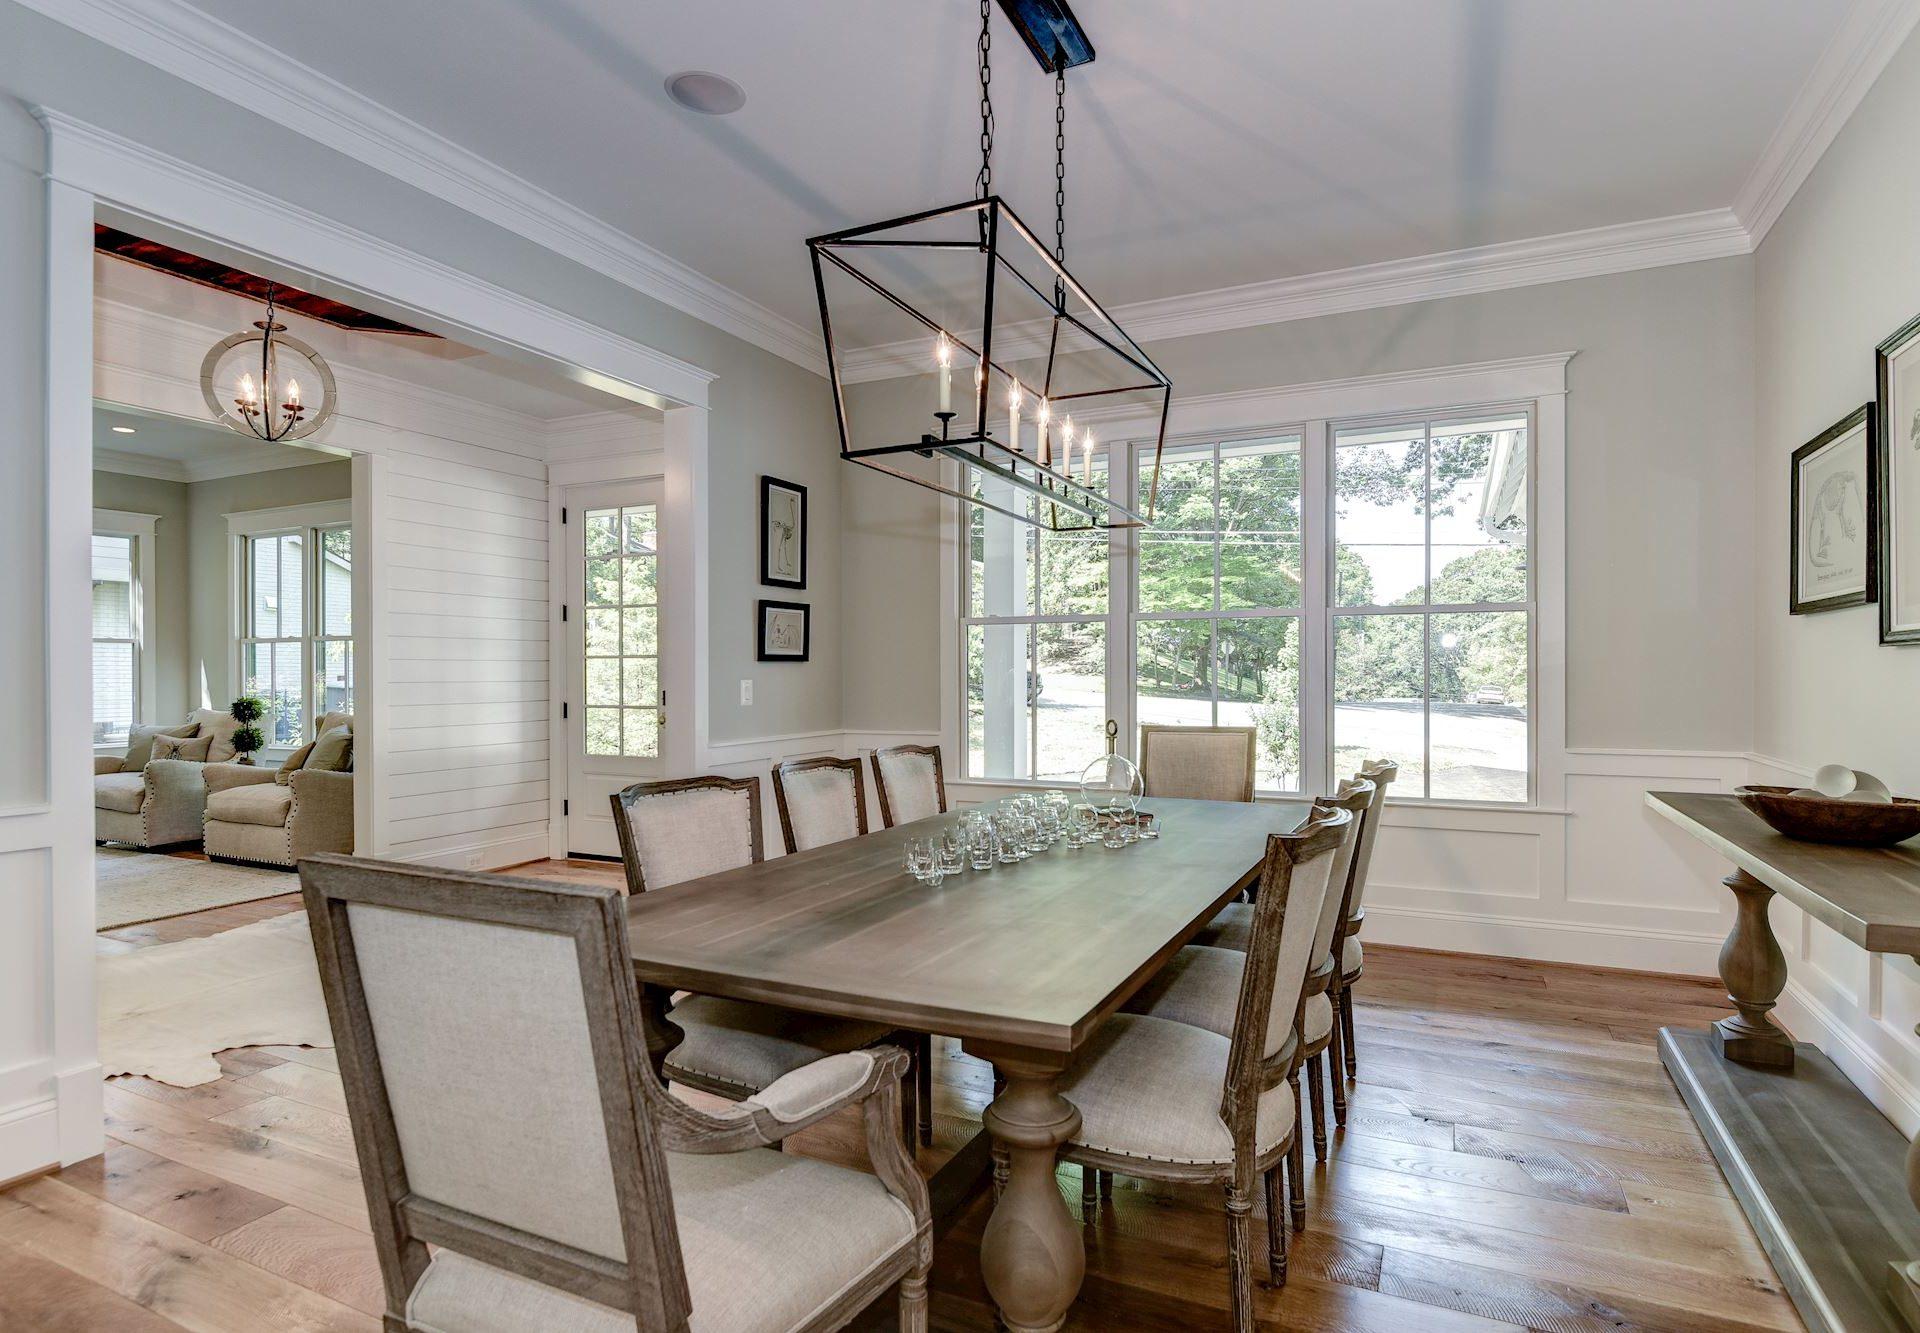 Crestwood Dining Room